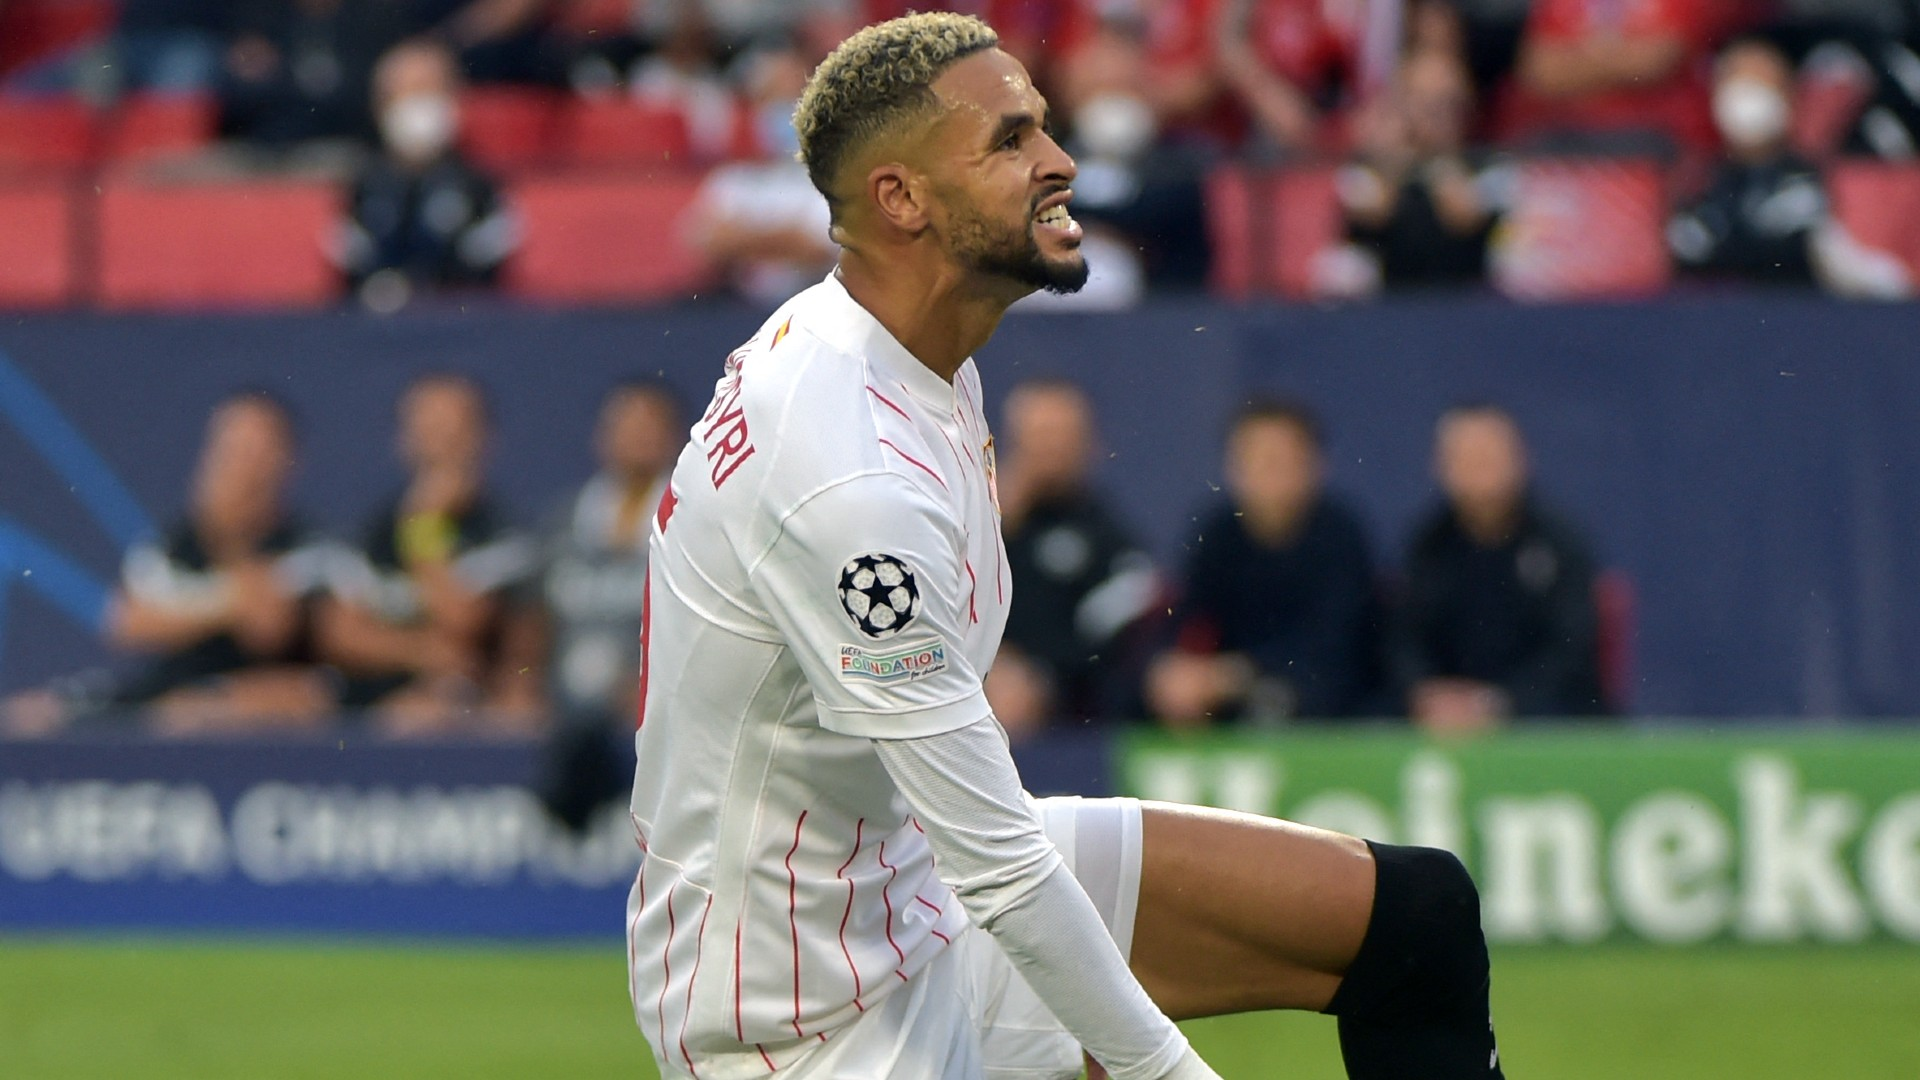 Champions League: Sevilla's En-Nesyri sets unwanted record in Salzburg draw